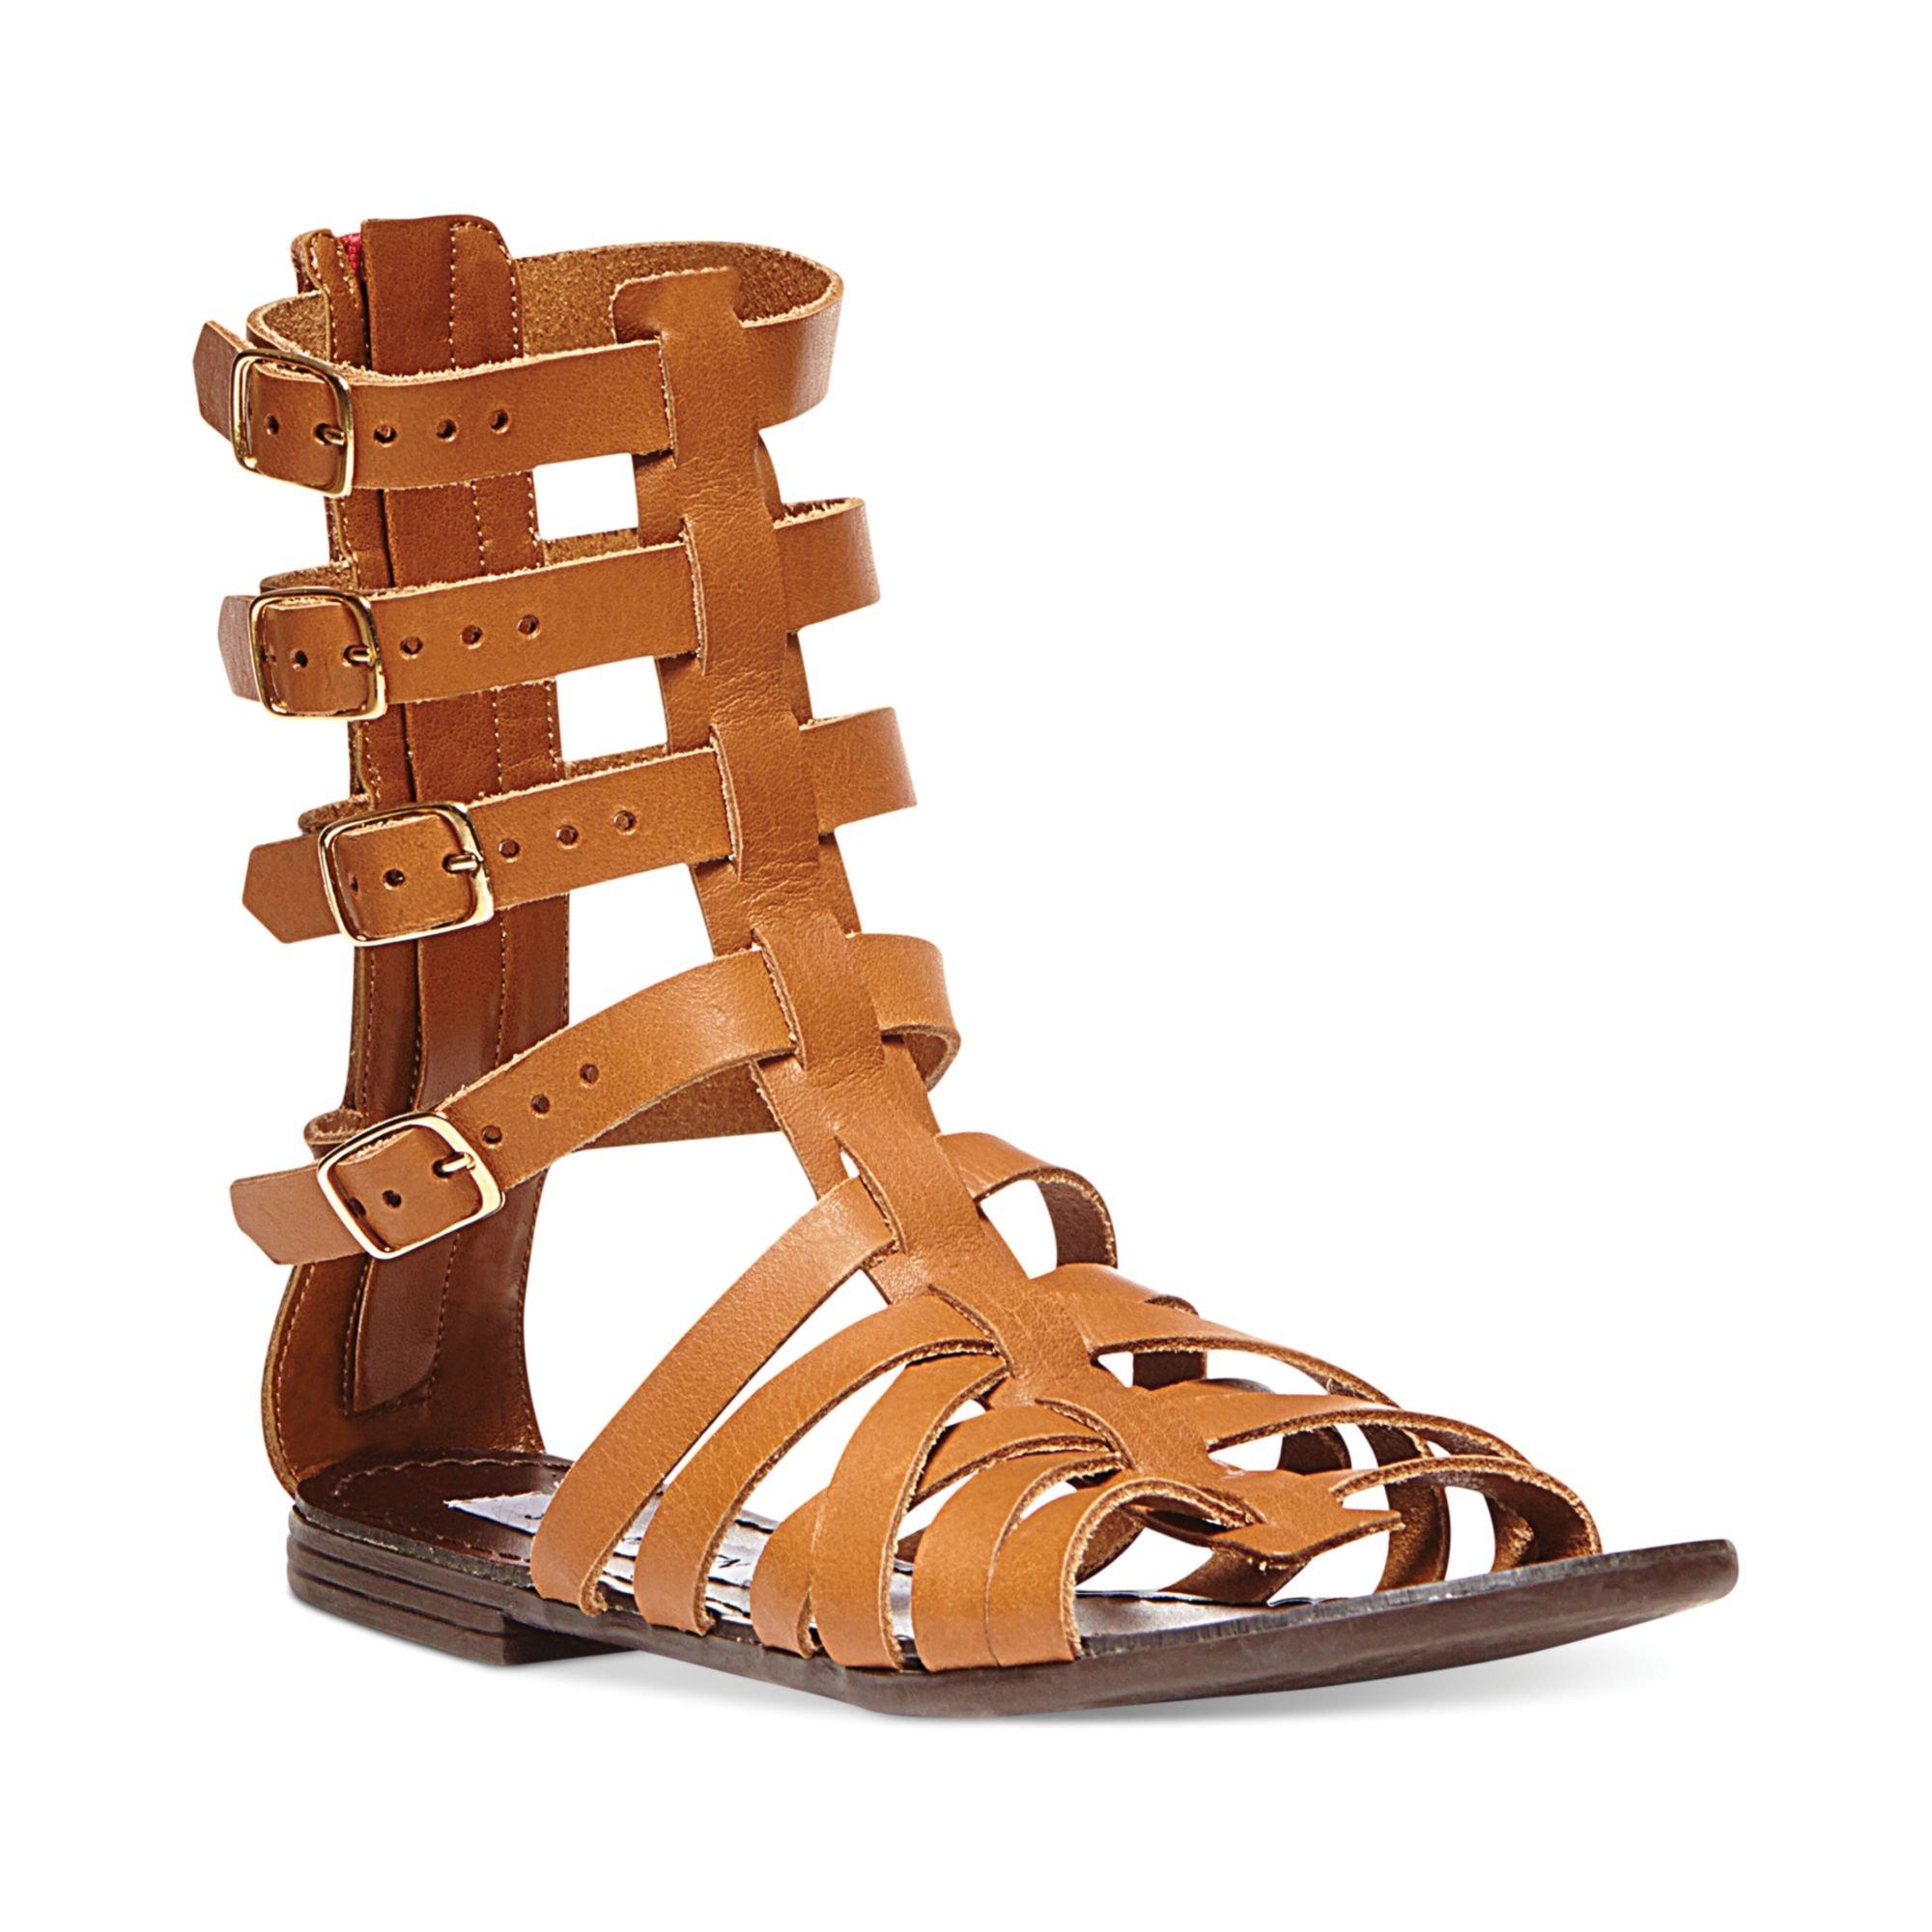 Steve Madden Womens Ceaserr Flat Gladiator Sandals In